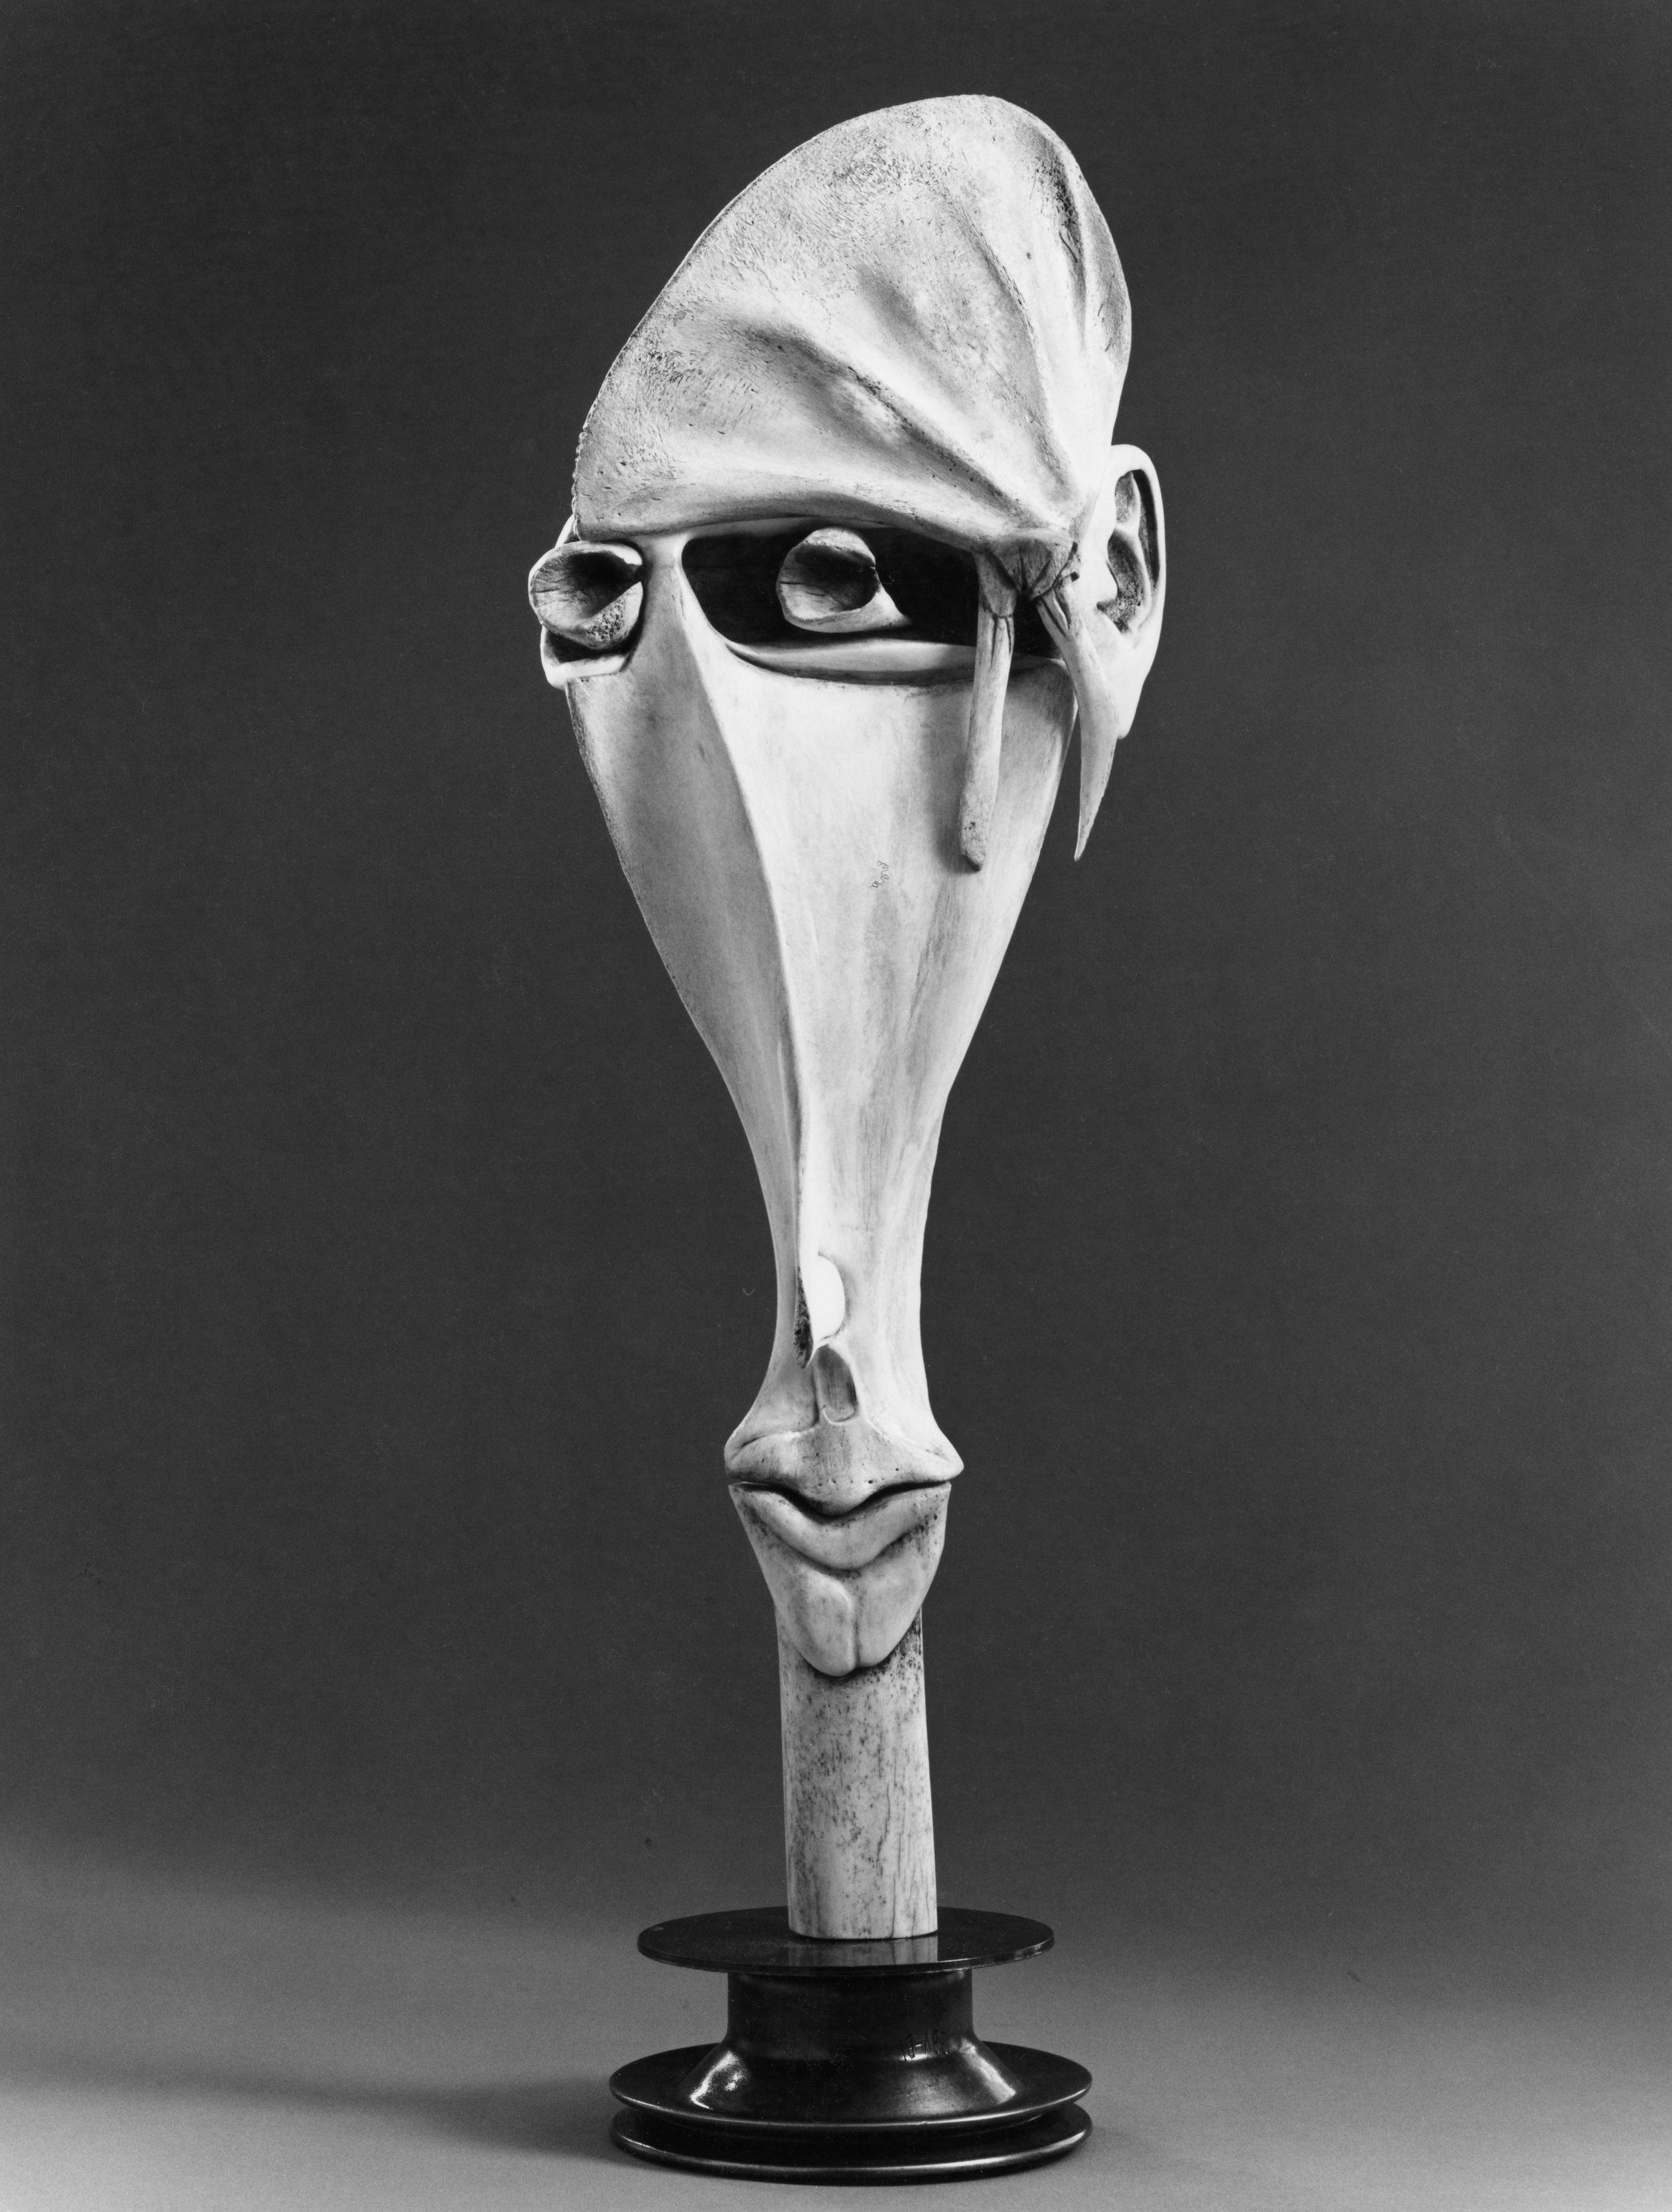 Face - Bone Sculpture by Jerry Hardin